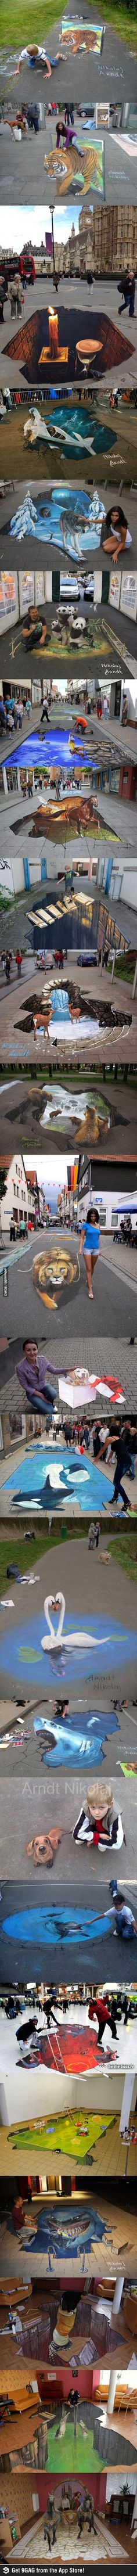 Arte callejero impresionante / Awesome Street Art